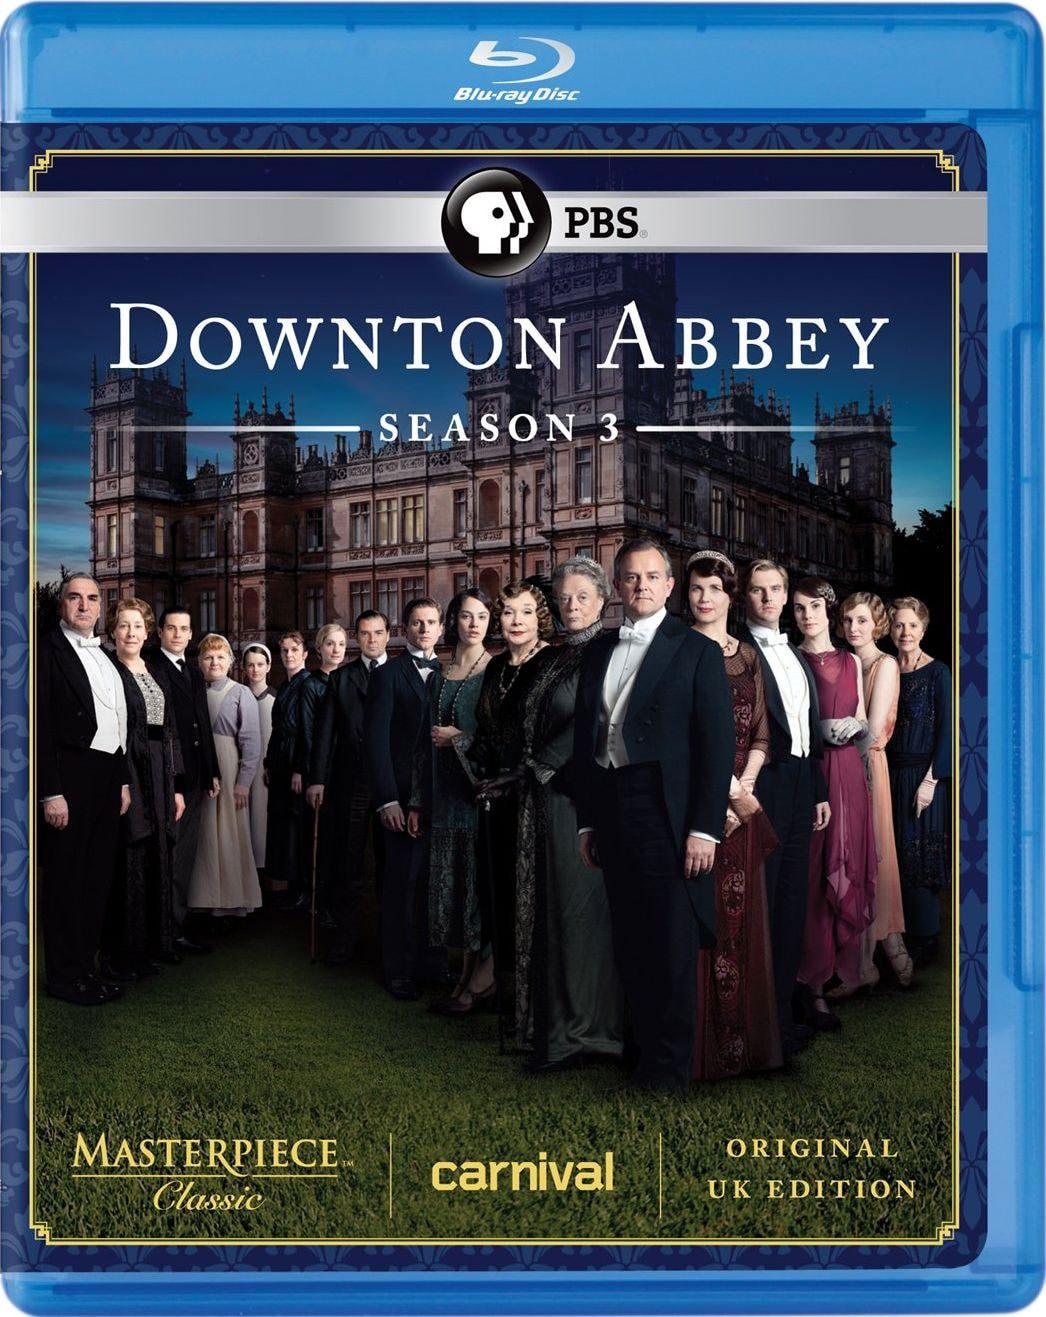 Masterpiece Classic: Downton Abbey: Season 3 (Blu-ray Disc)